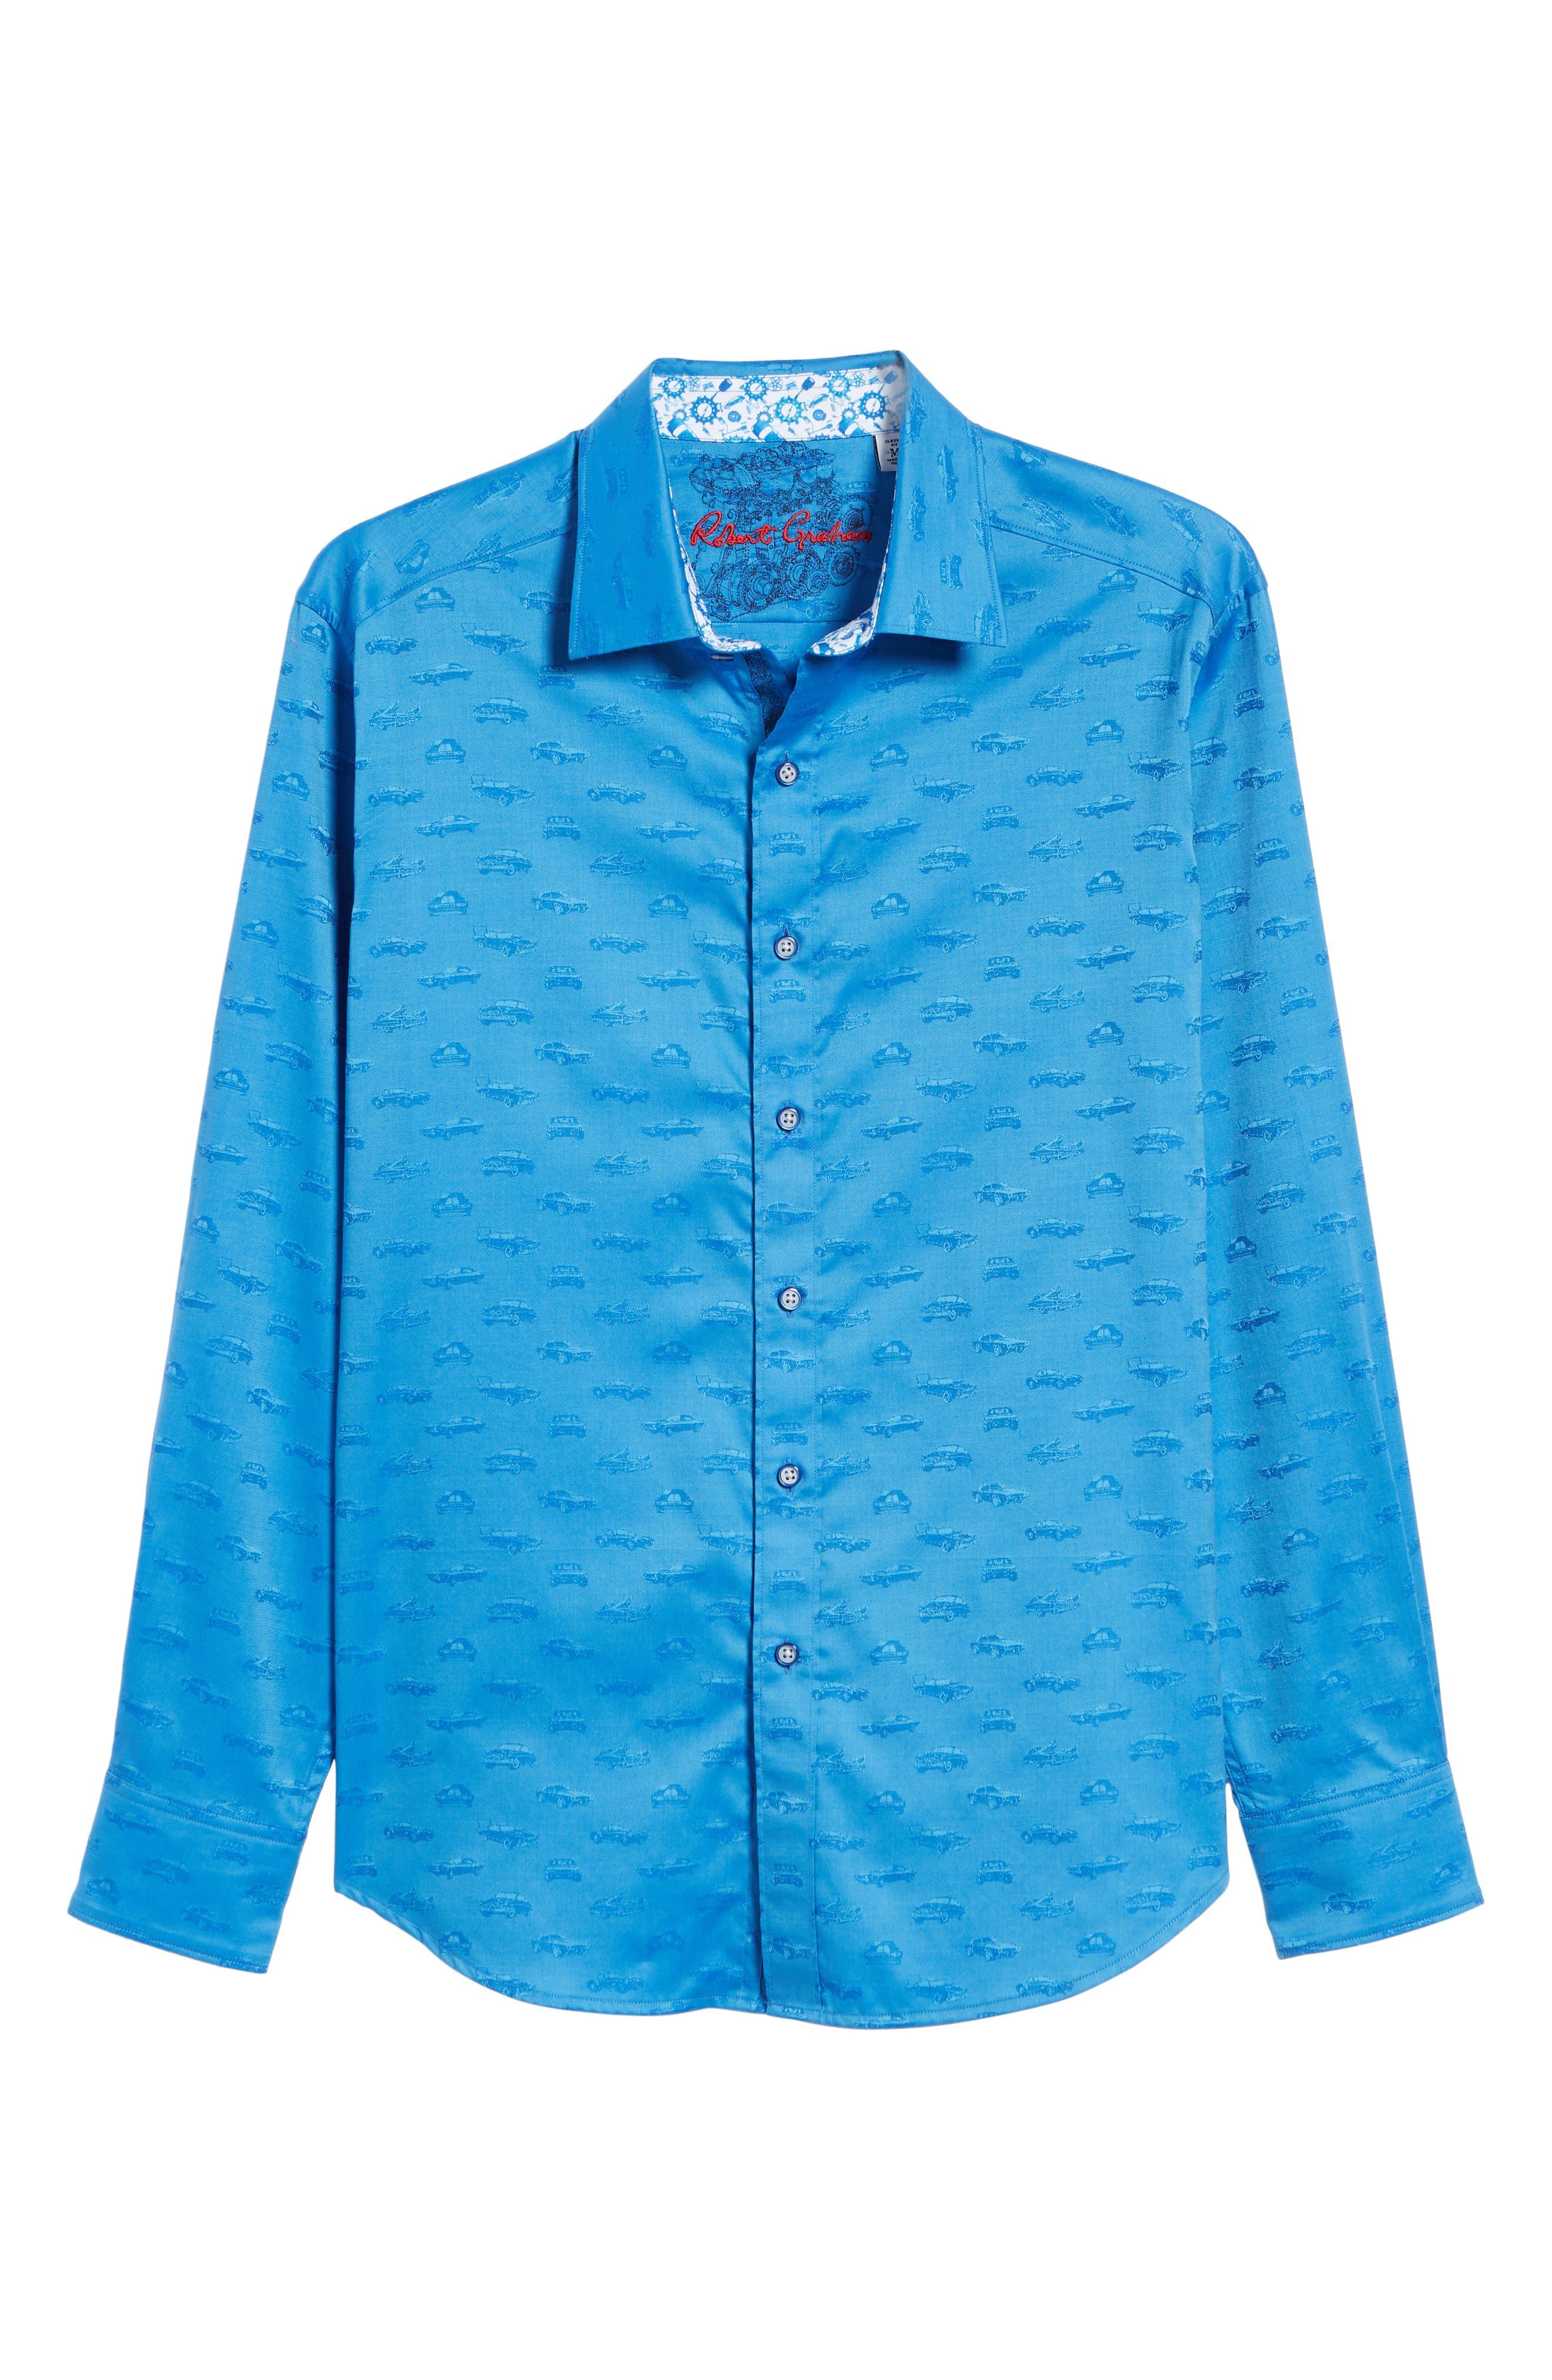 ROBERT GRAHAM,                             Car Enthusiast Jacquard Sport Shirt,                             Alternate thumbnail 5, color,                             COBALT